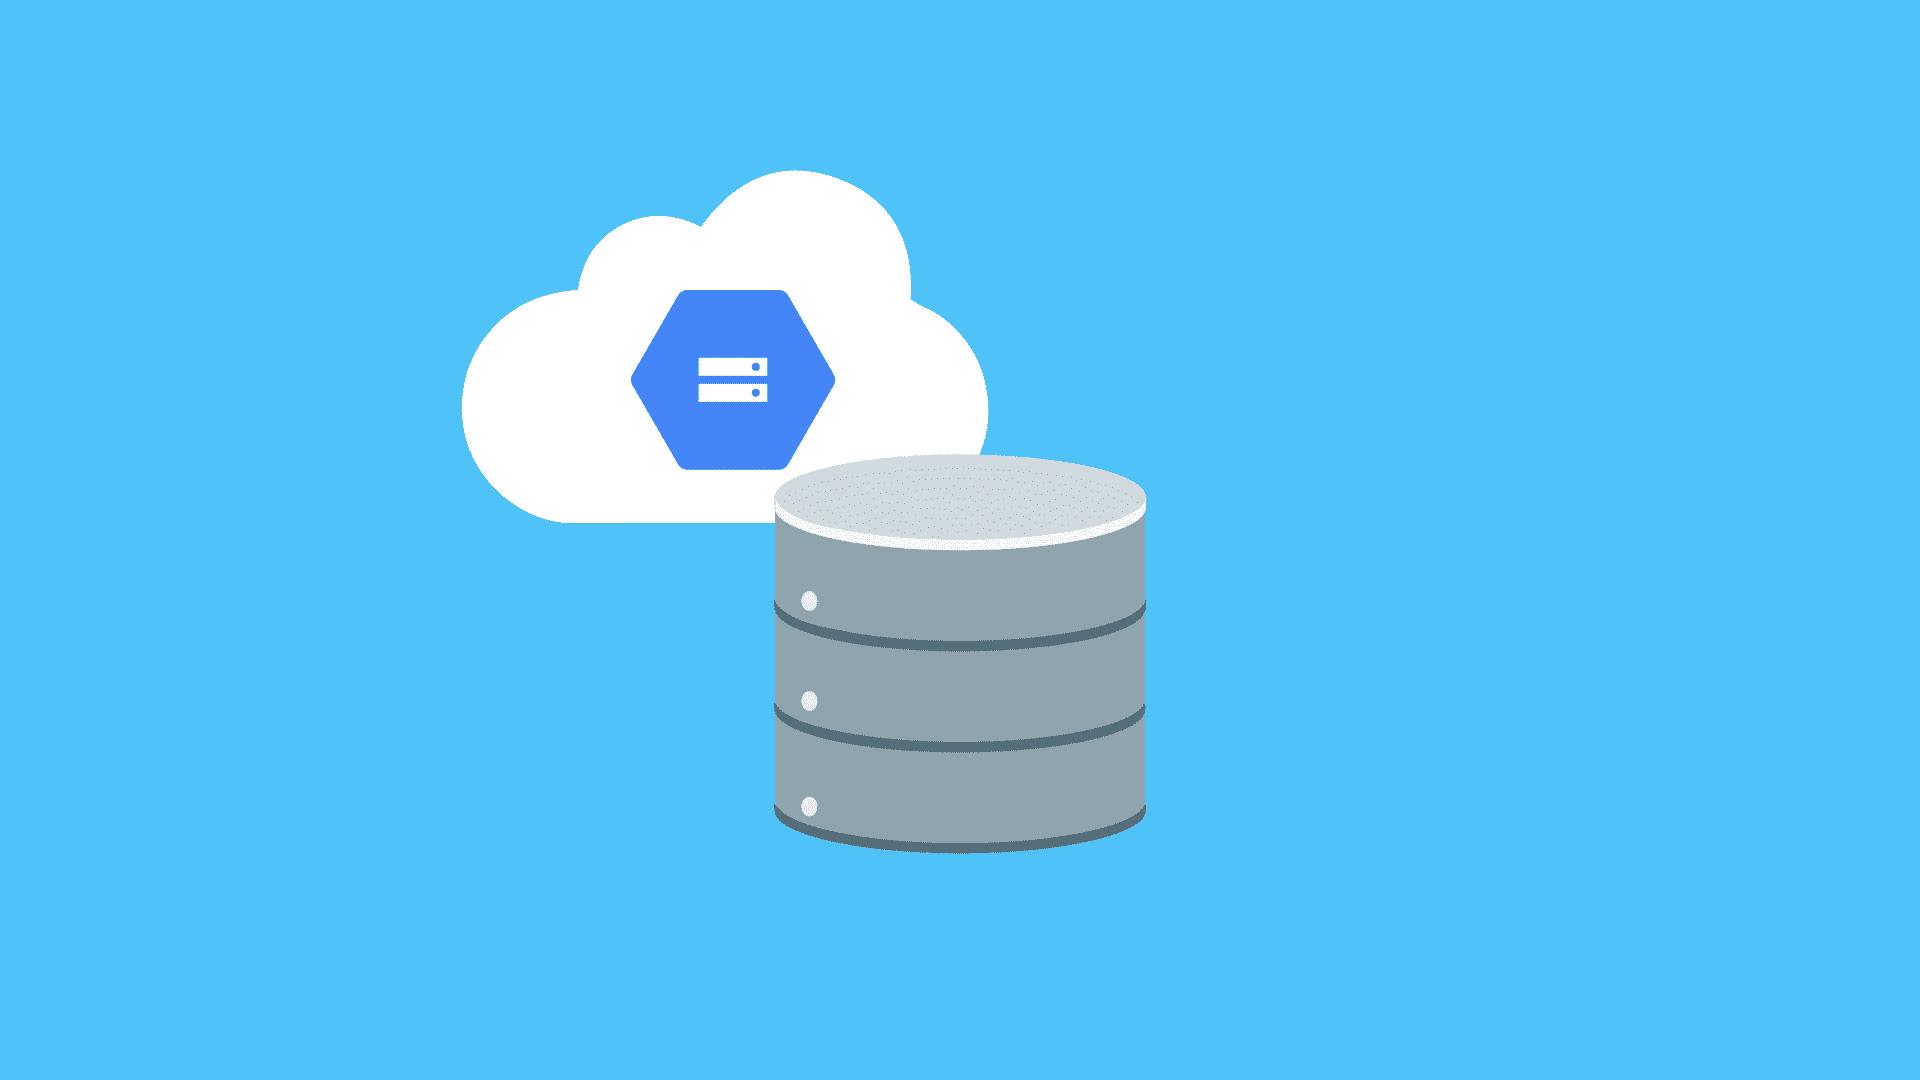 Database cloud